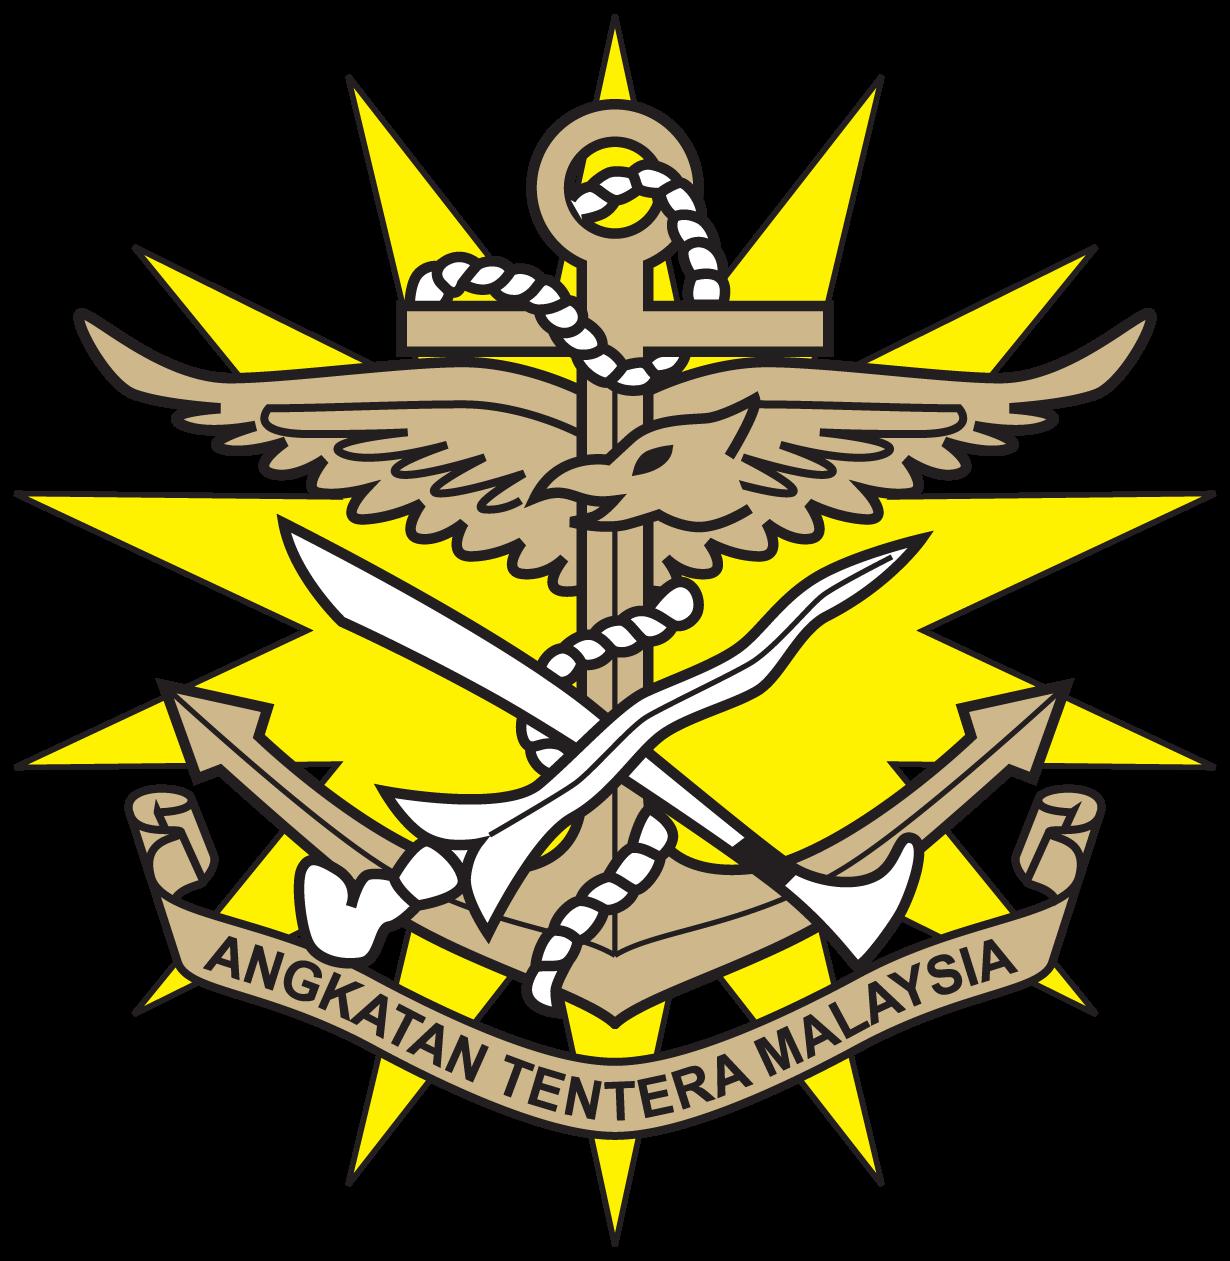 Jawatan Kosong Di Angkatan Tentera Malaysia ATM